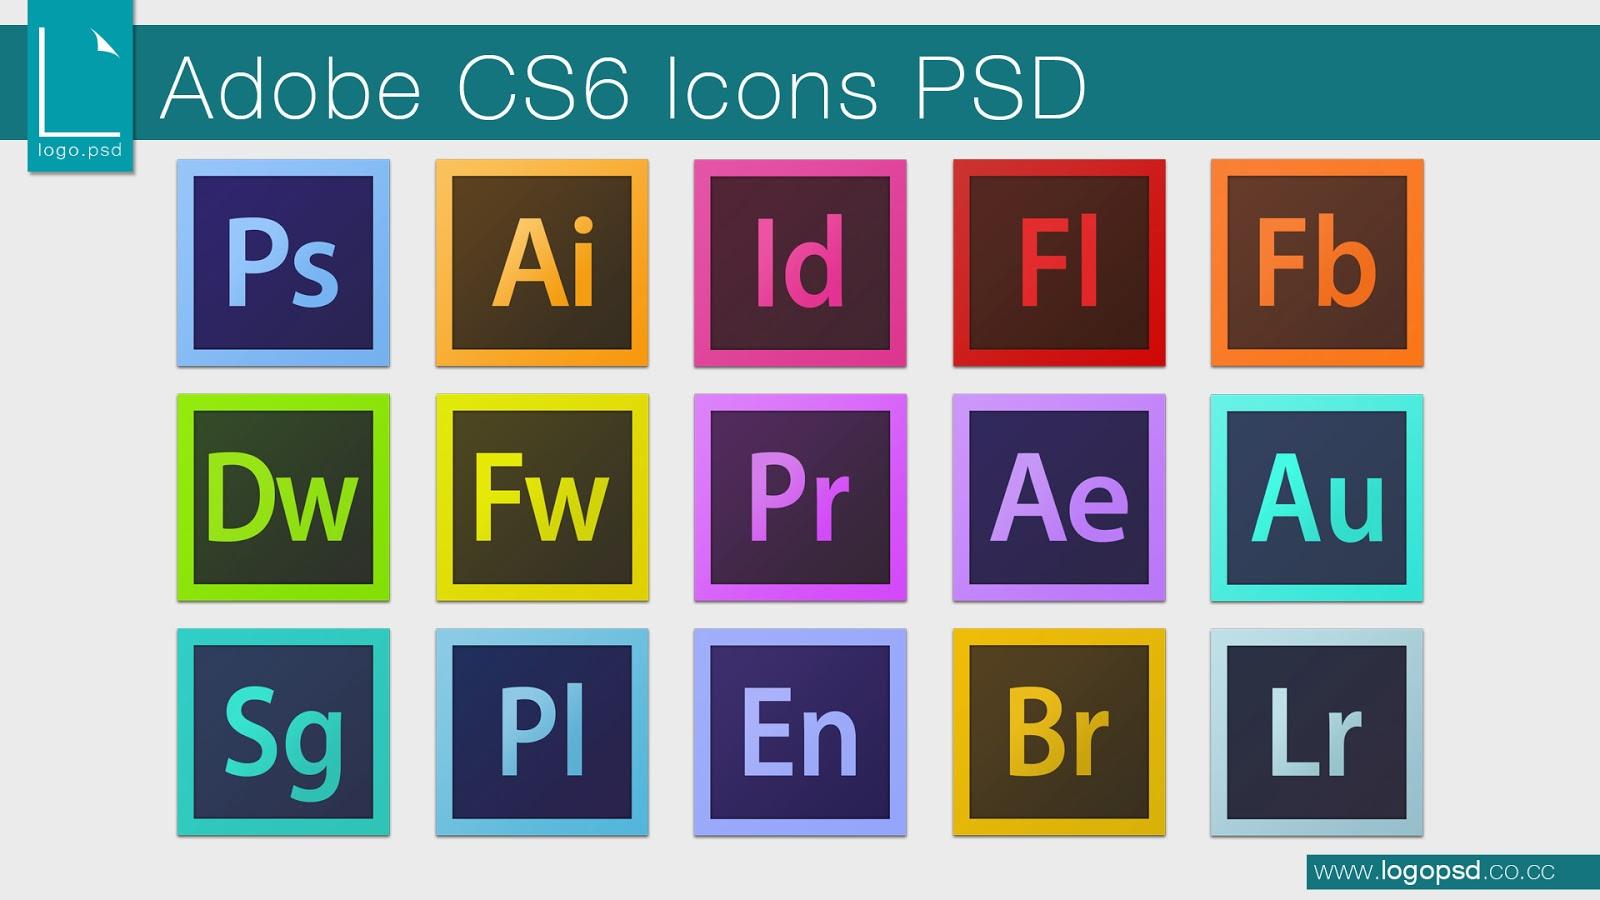 15 Adobe 8.1 Icon Images